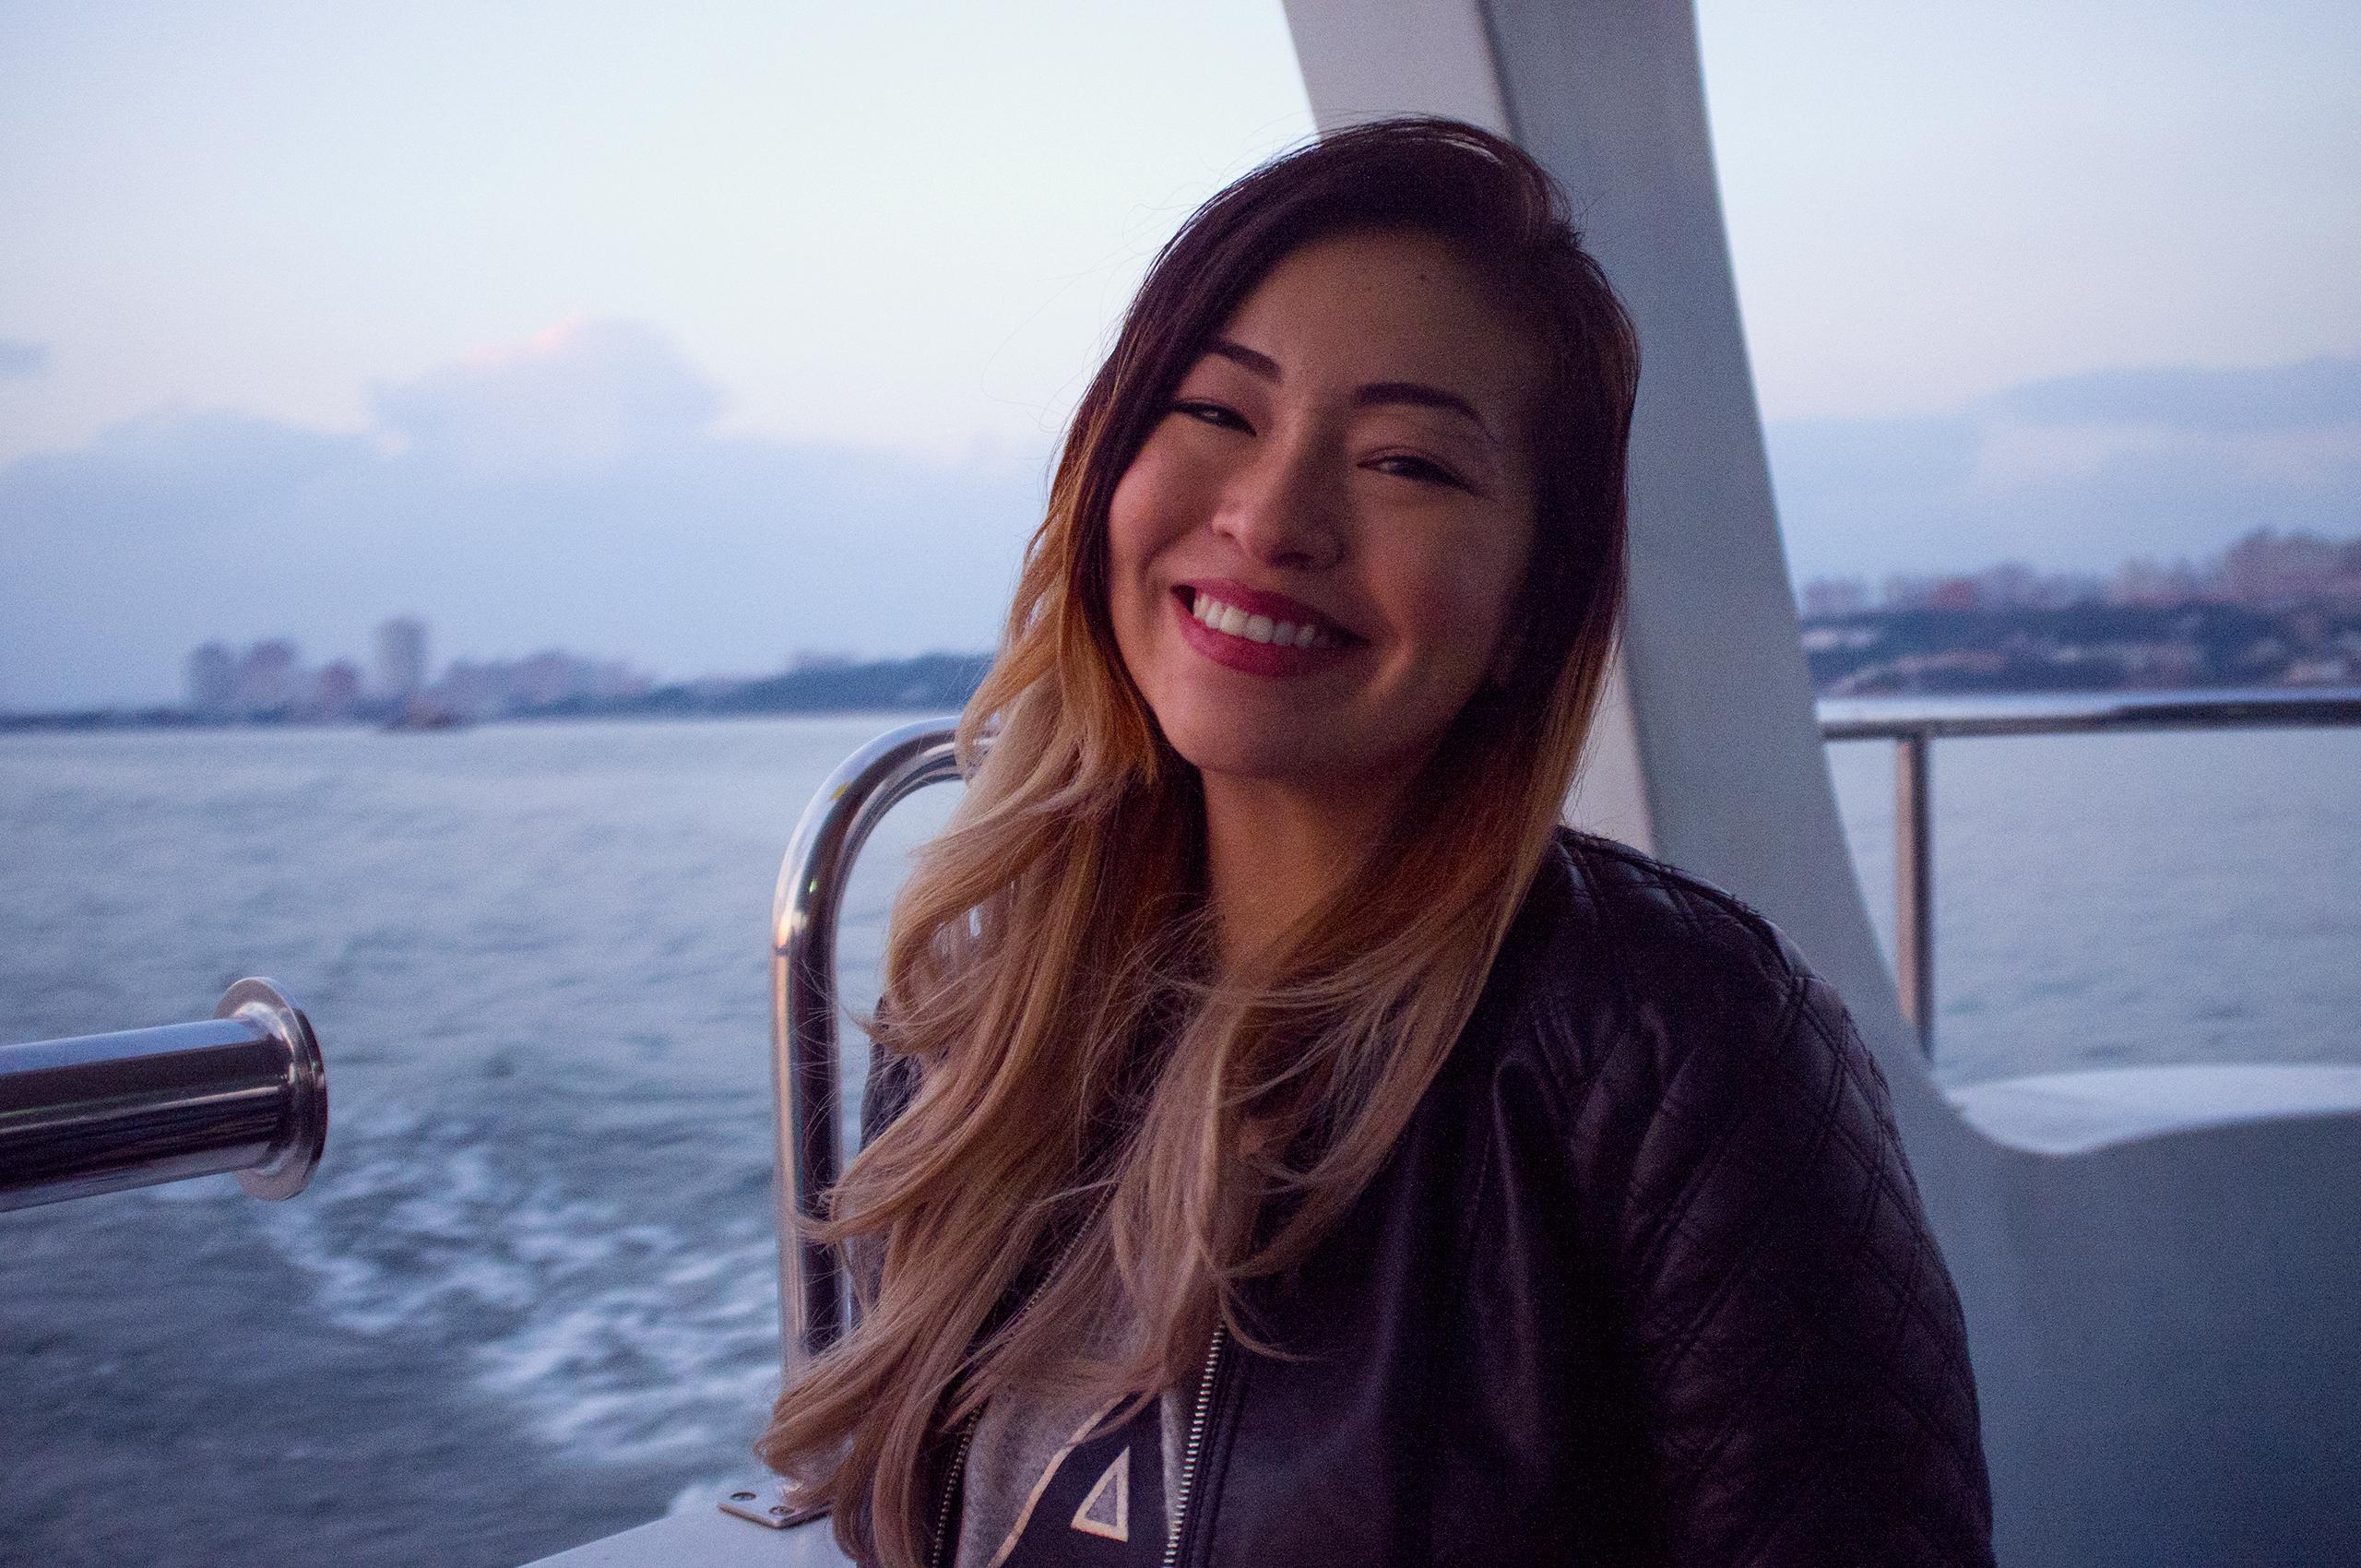 Devon smiling on a boat